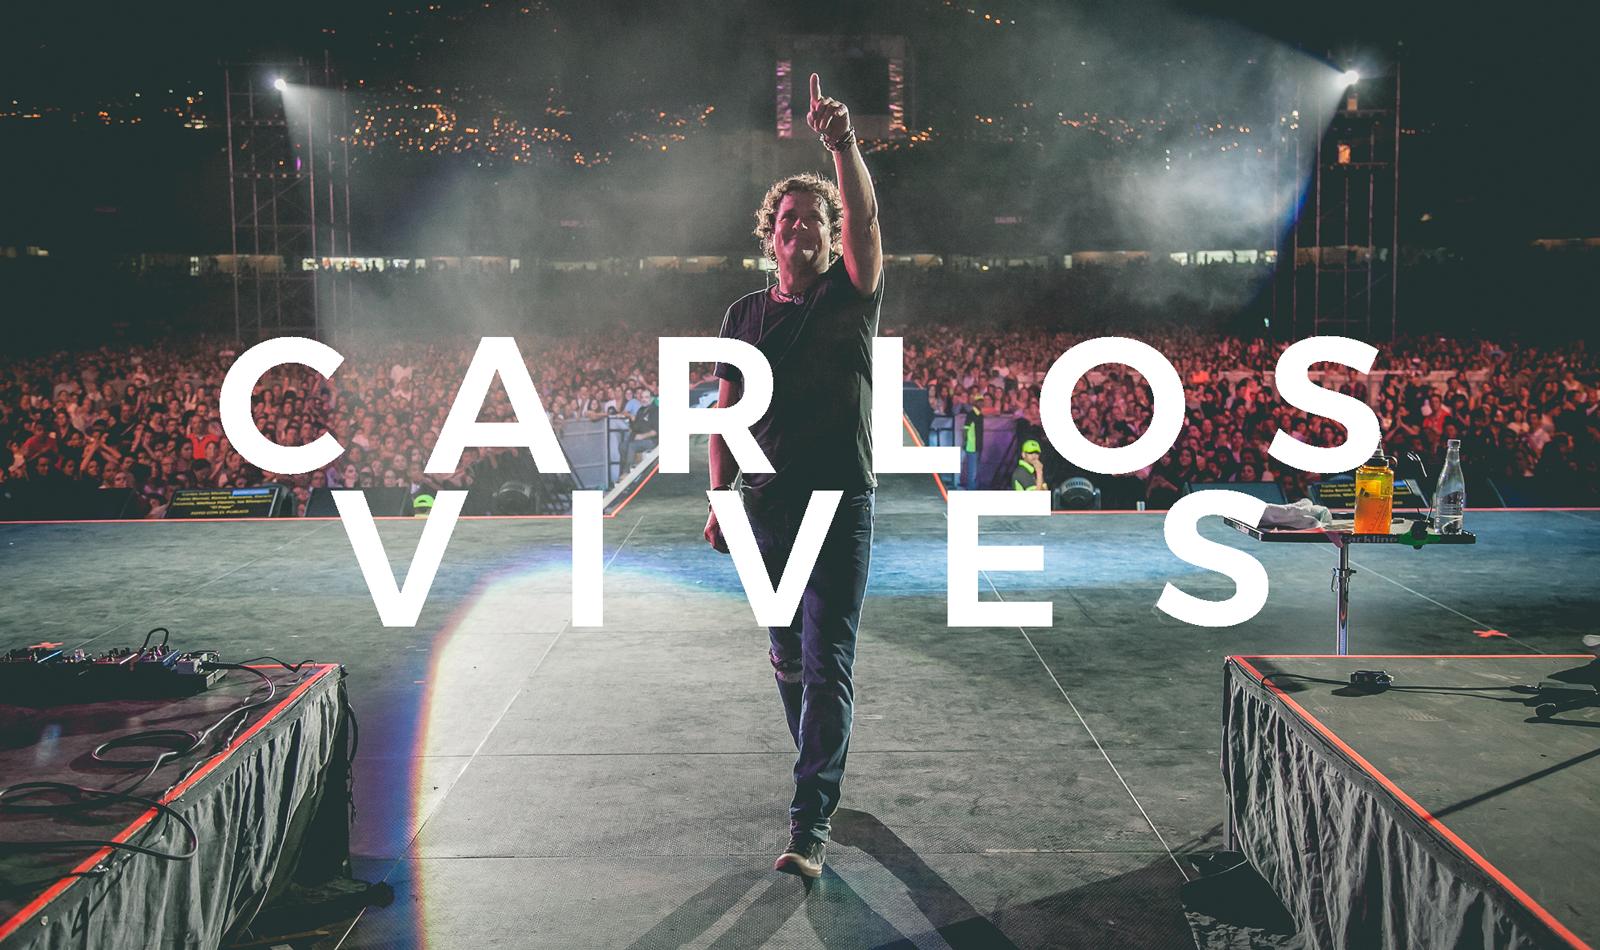 carlos-vives-biografia